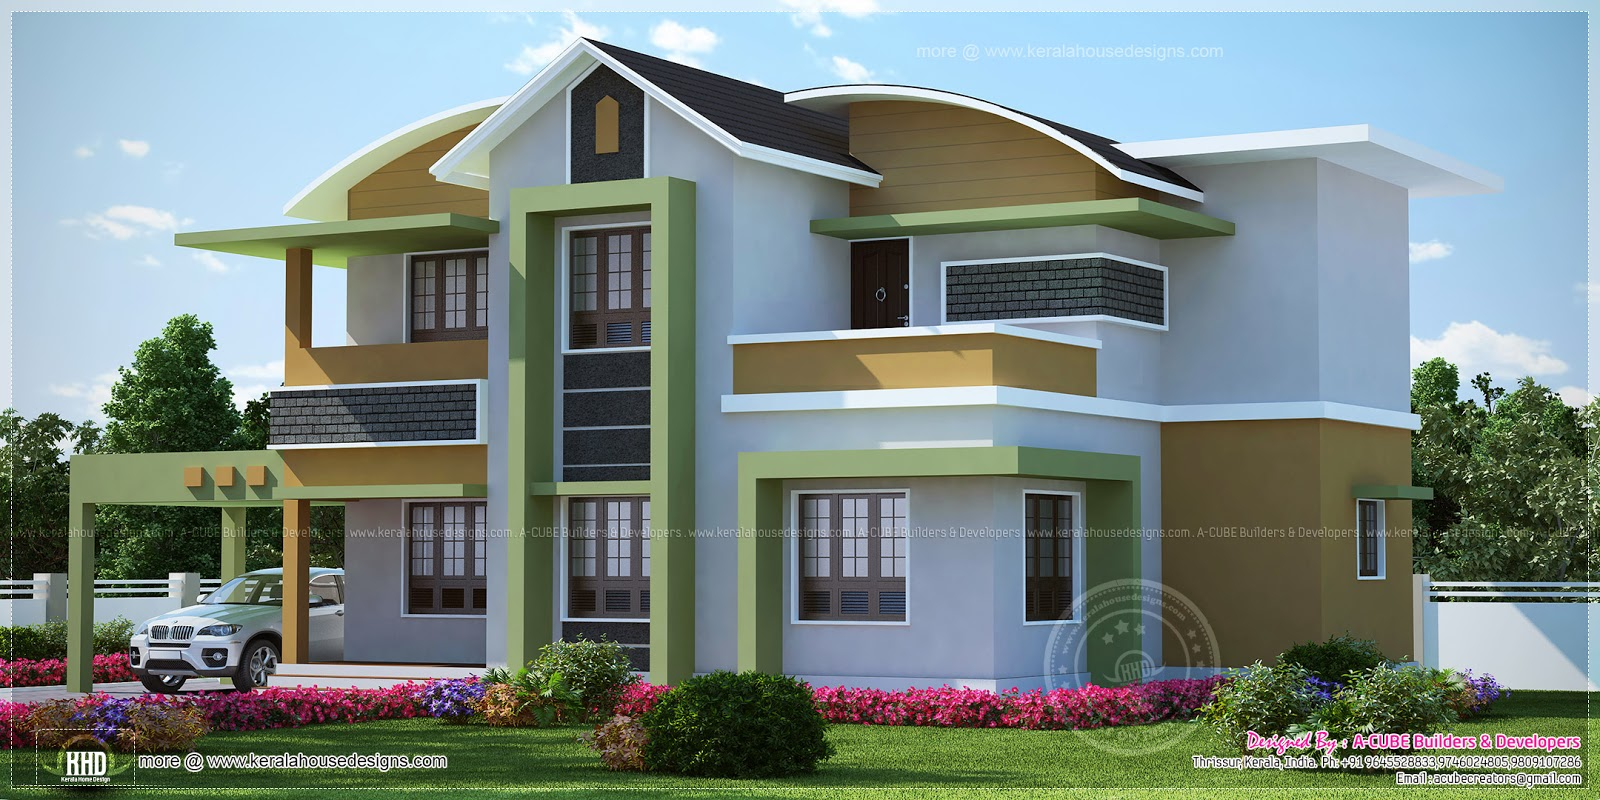 Kerala home design siddu buzz for 500 sq ft house plans in kerala